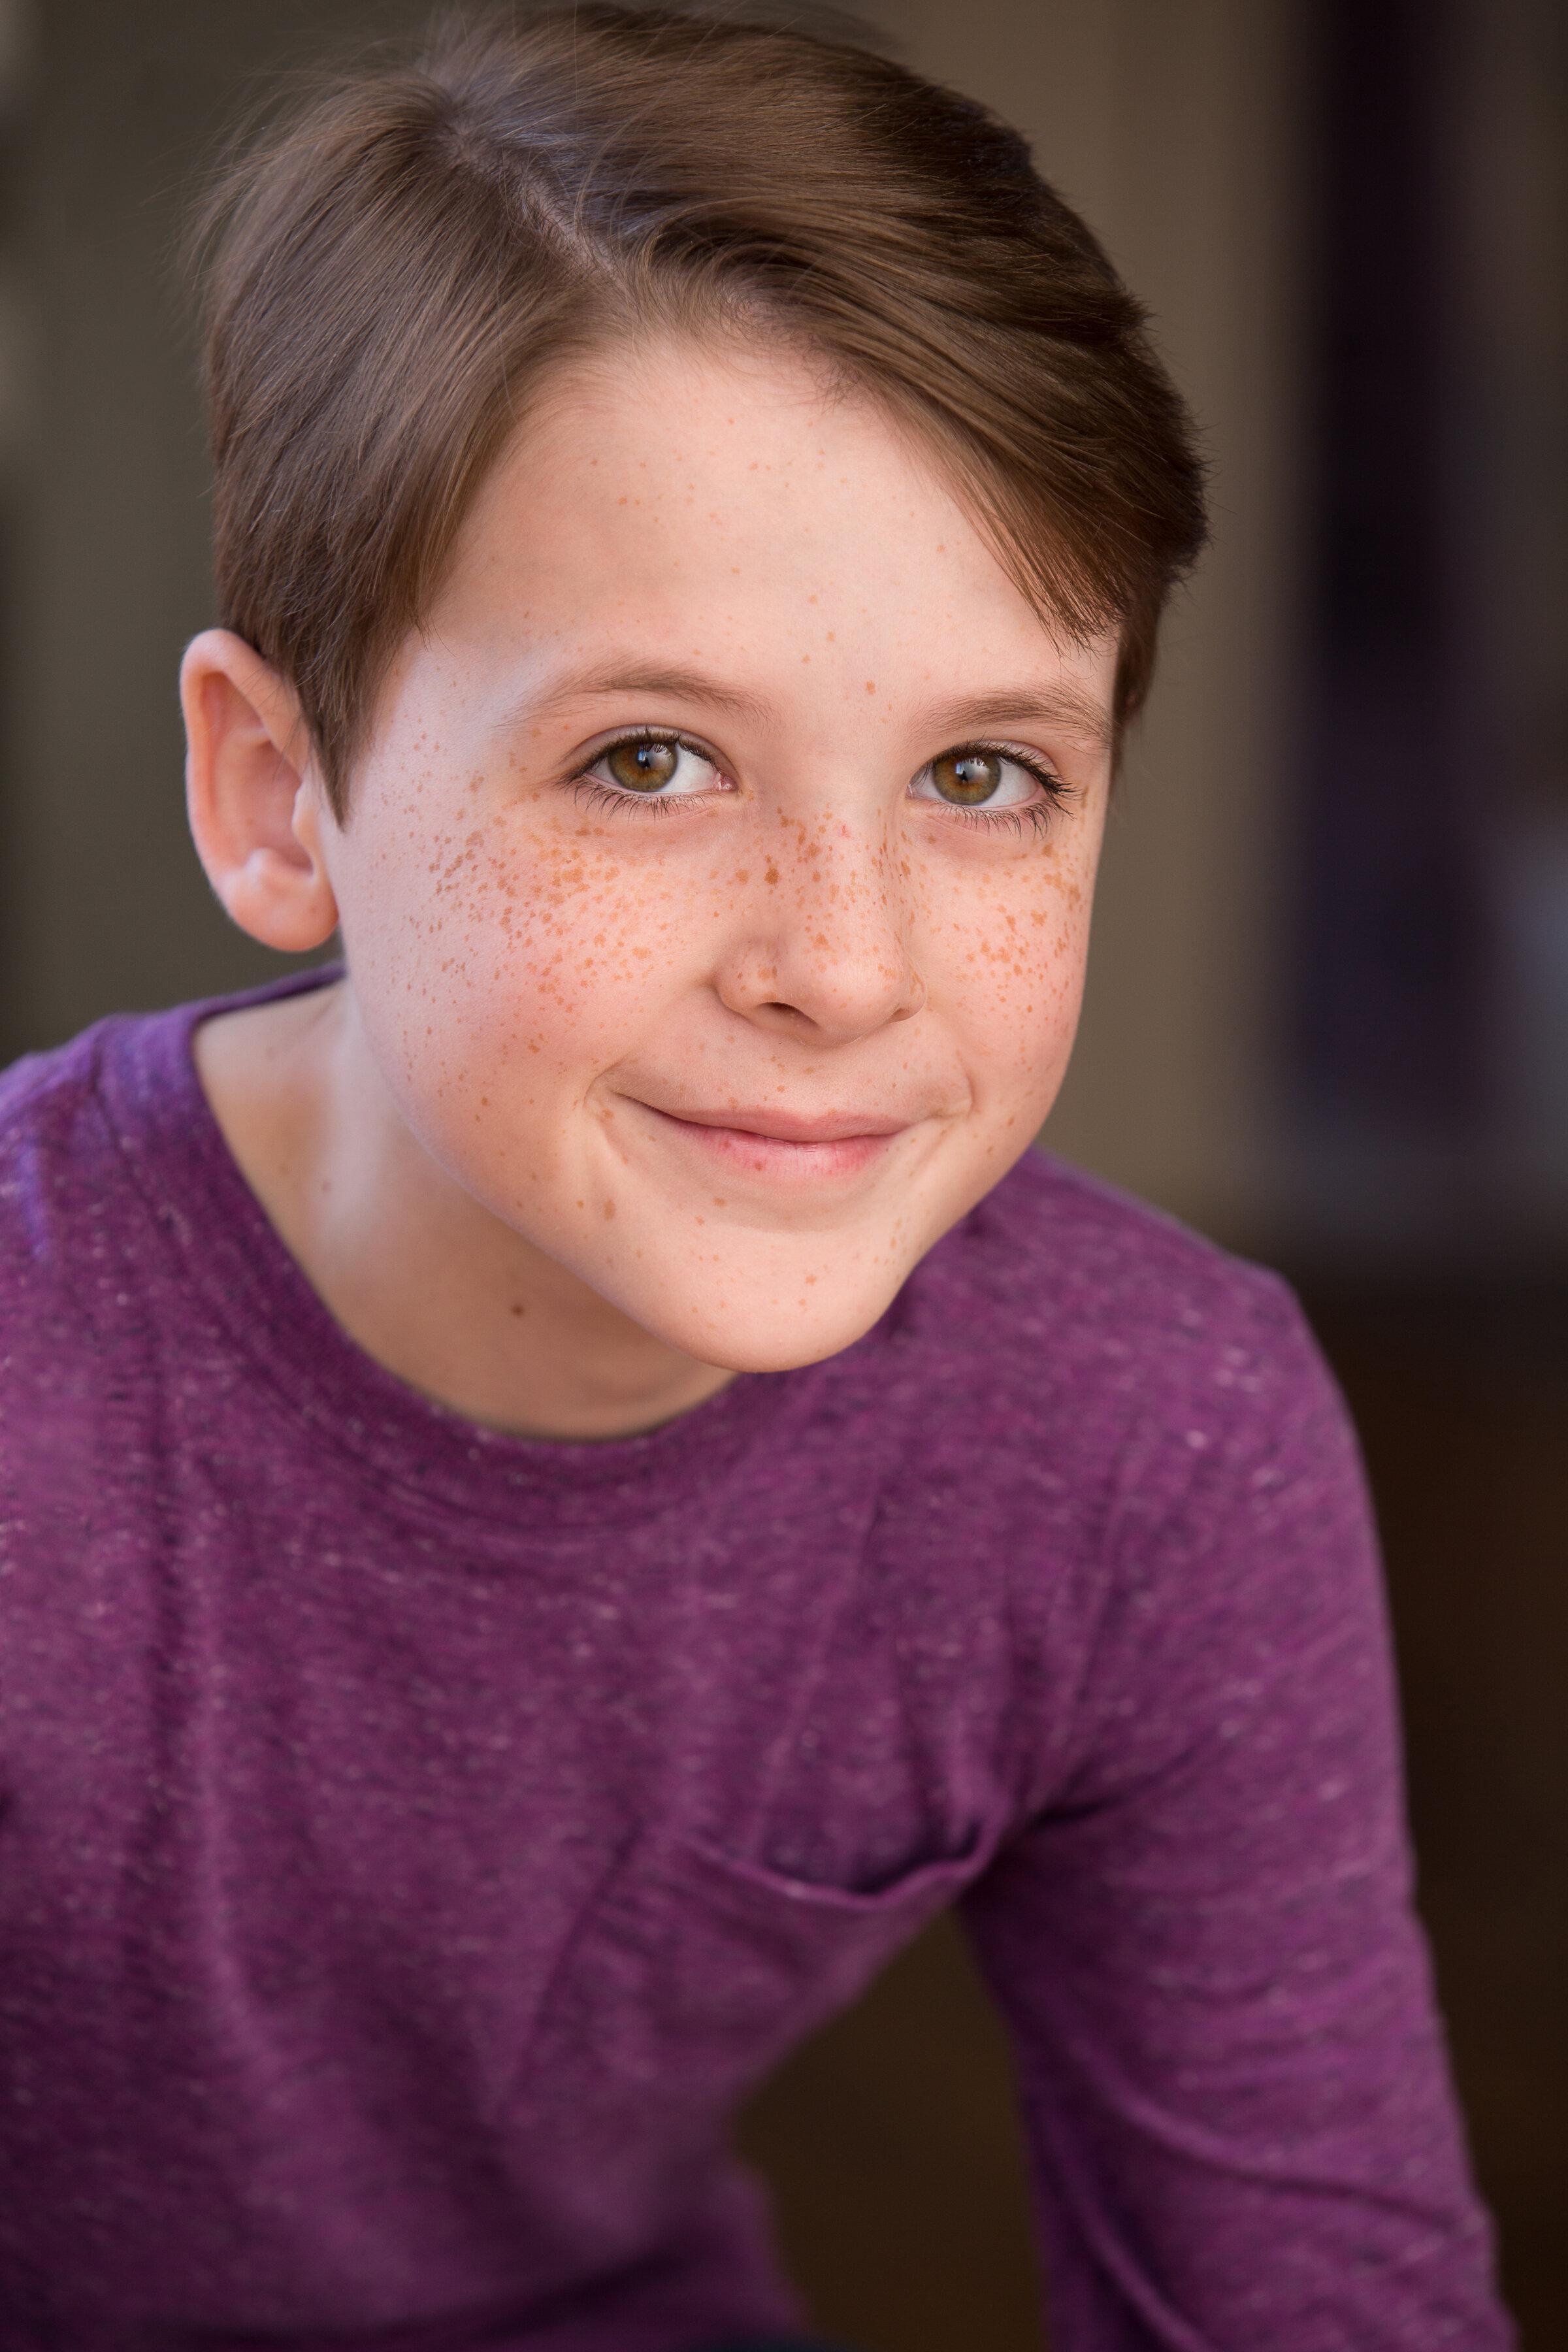 LIAM BECK-O'SULLIVAN Ethan Ferris (age 6)